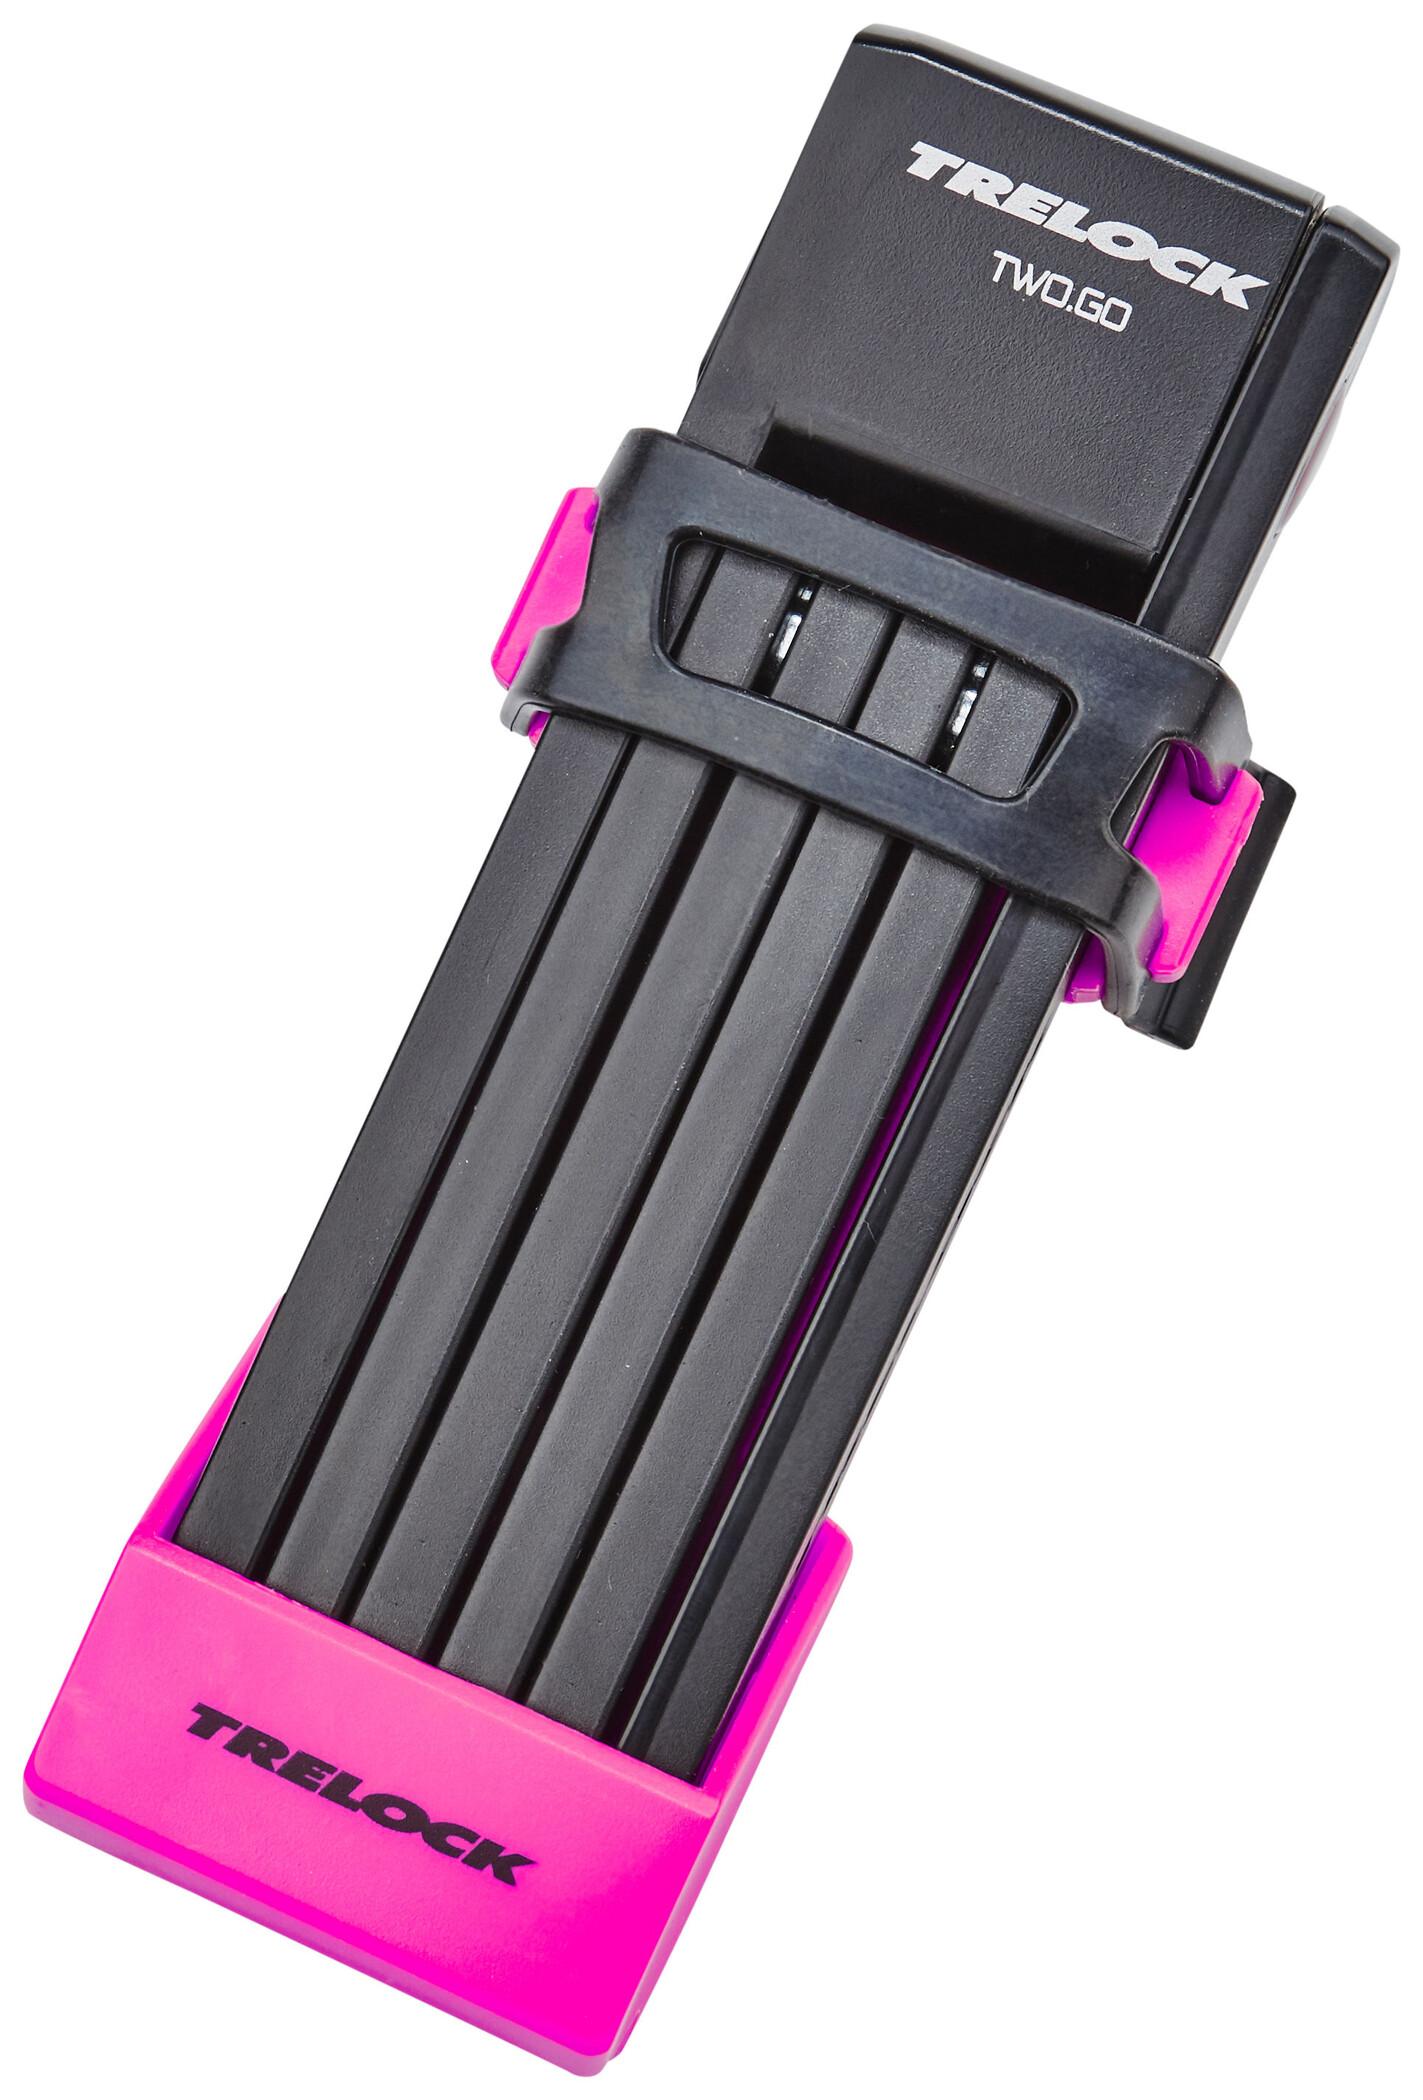 Trelock FS 200/75 TWO.GO Folding Lock 75 cm, white (2019) | Combo Lock